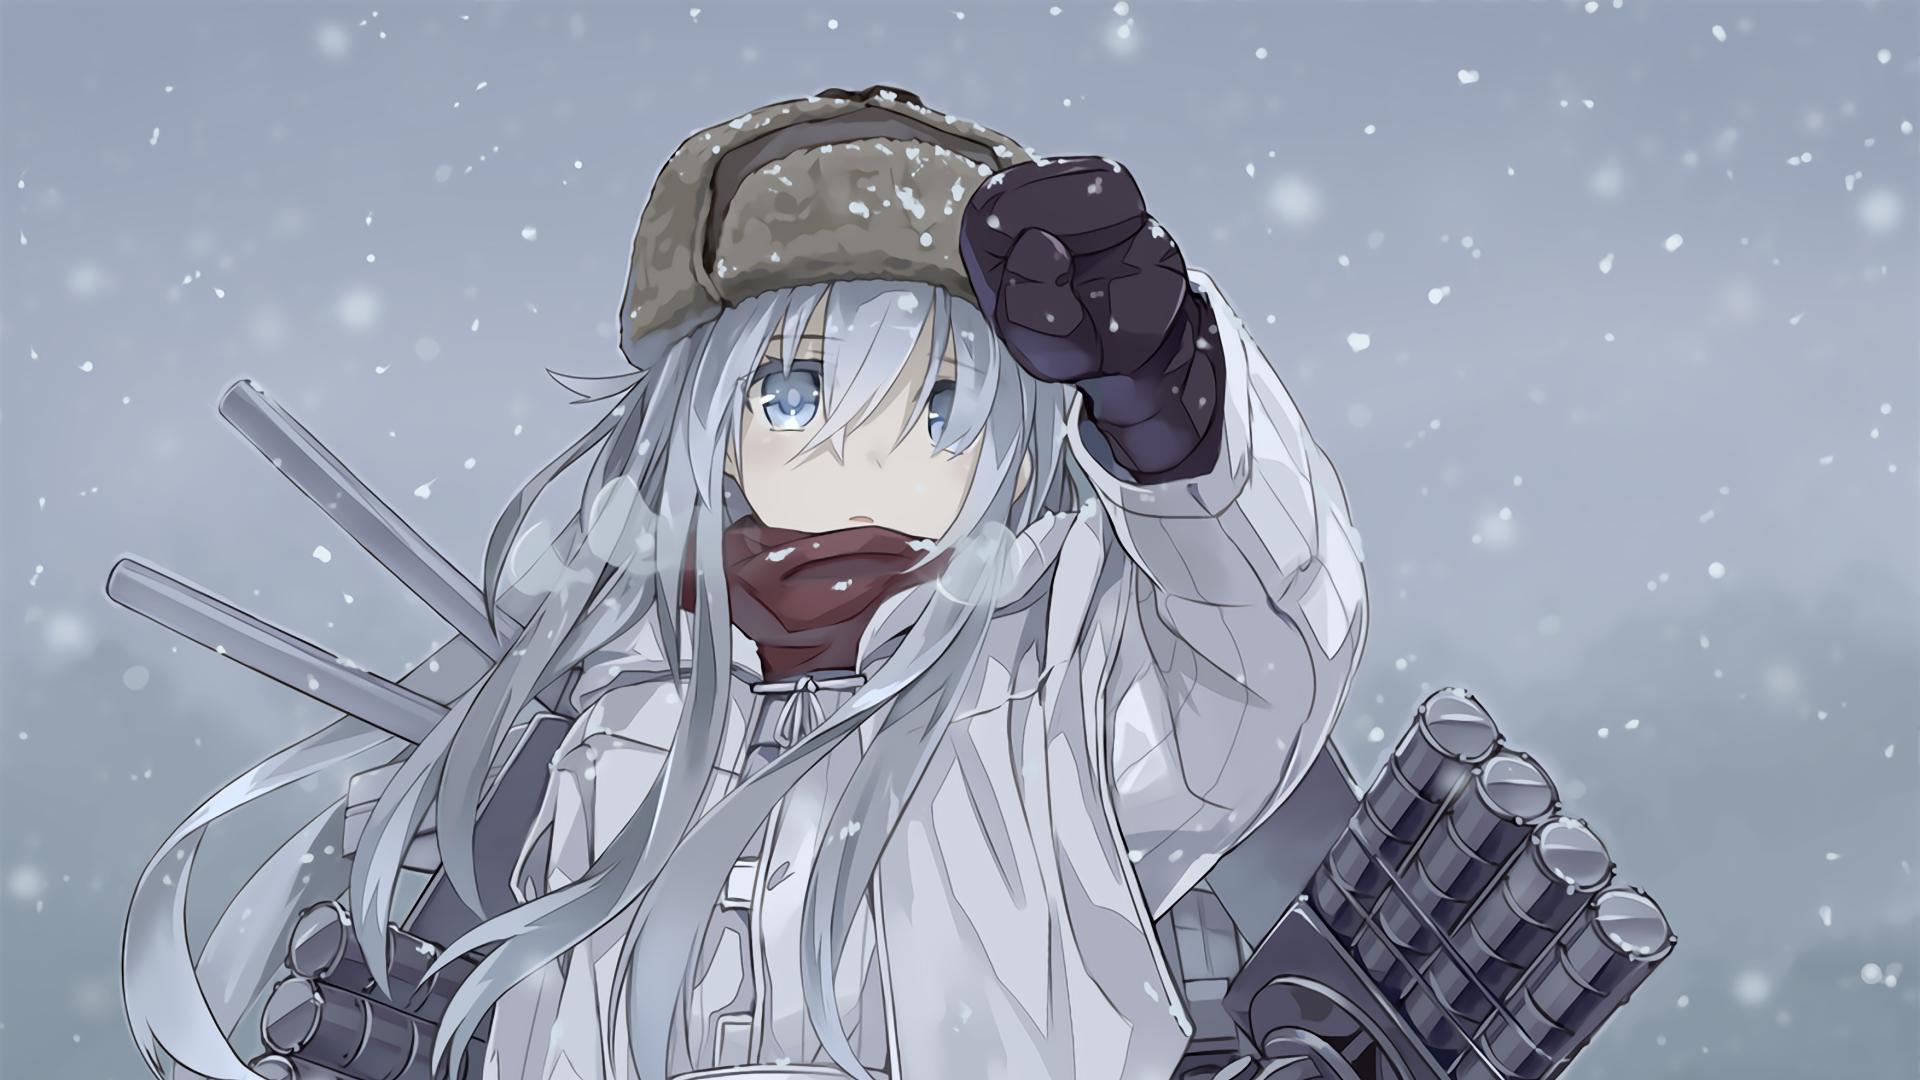 Steam Workshop 艦これ Vernyj Wallpaper In Snow Kancolle